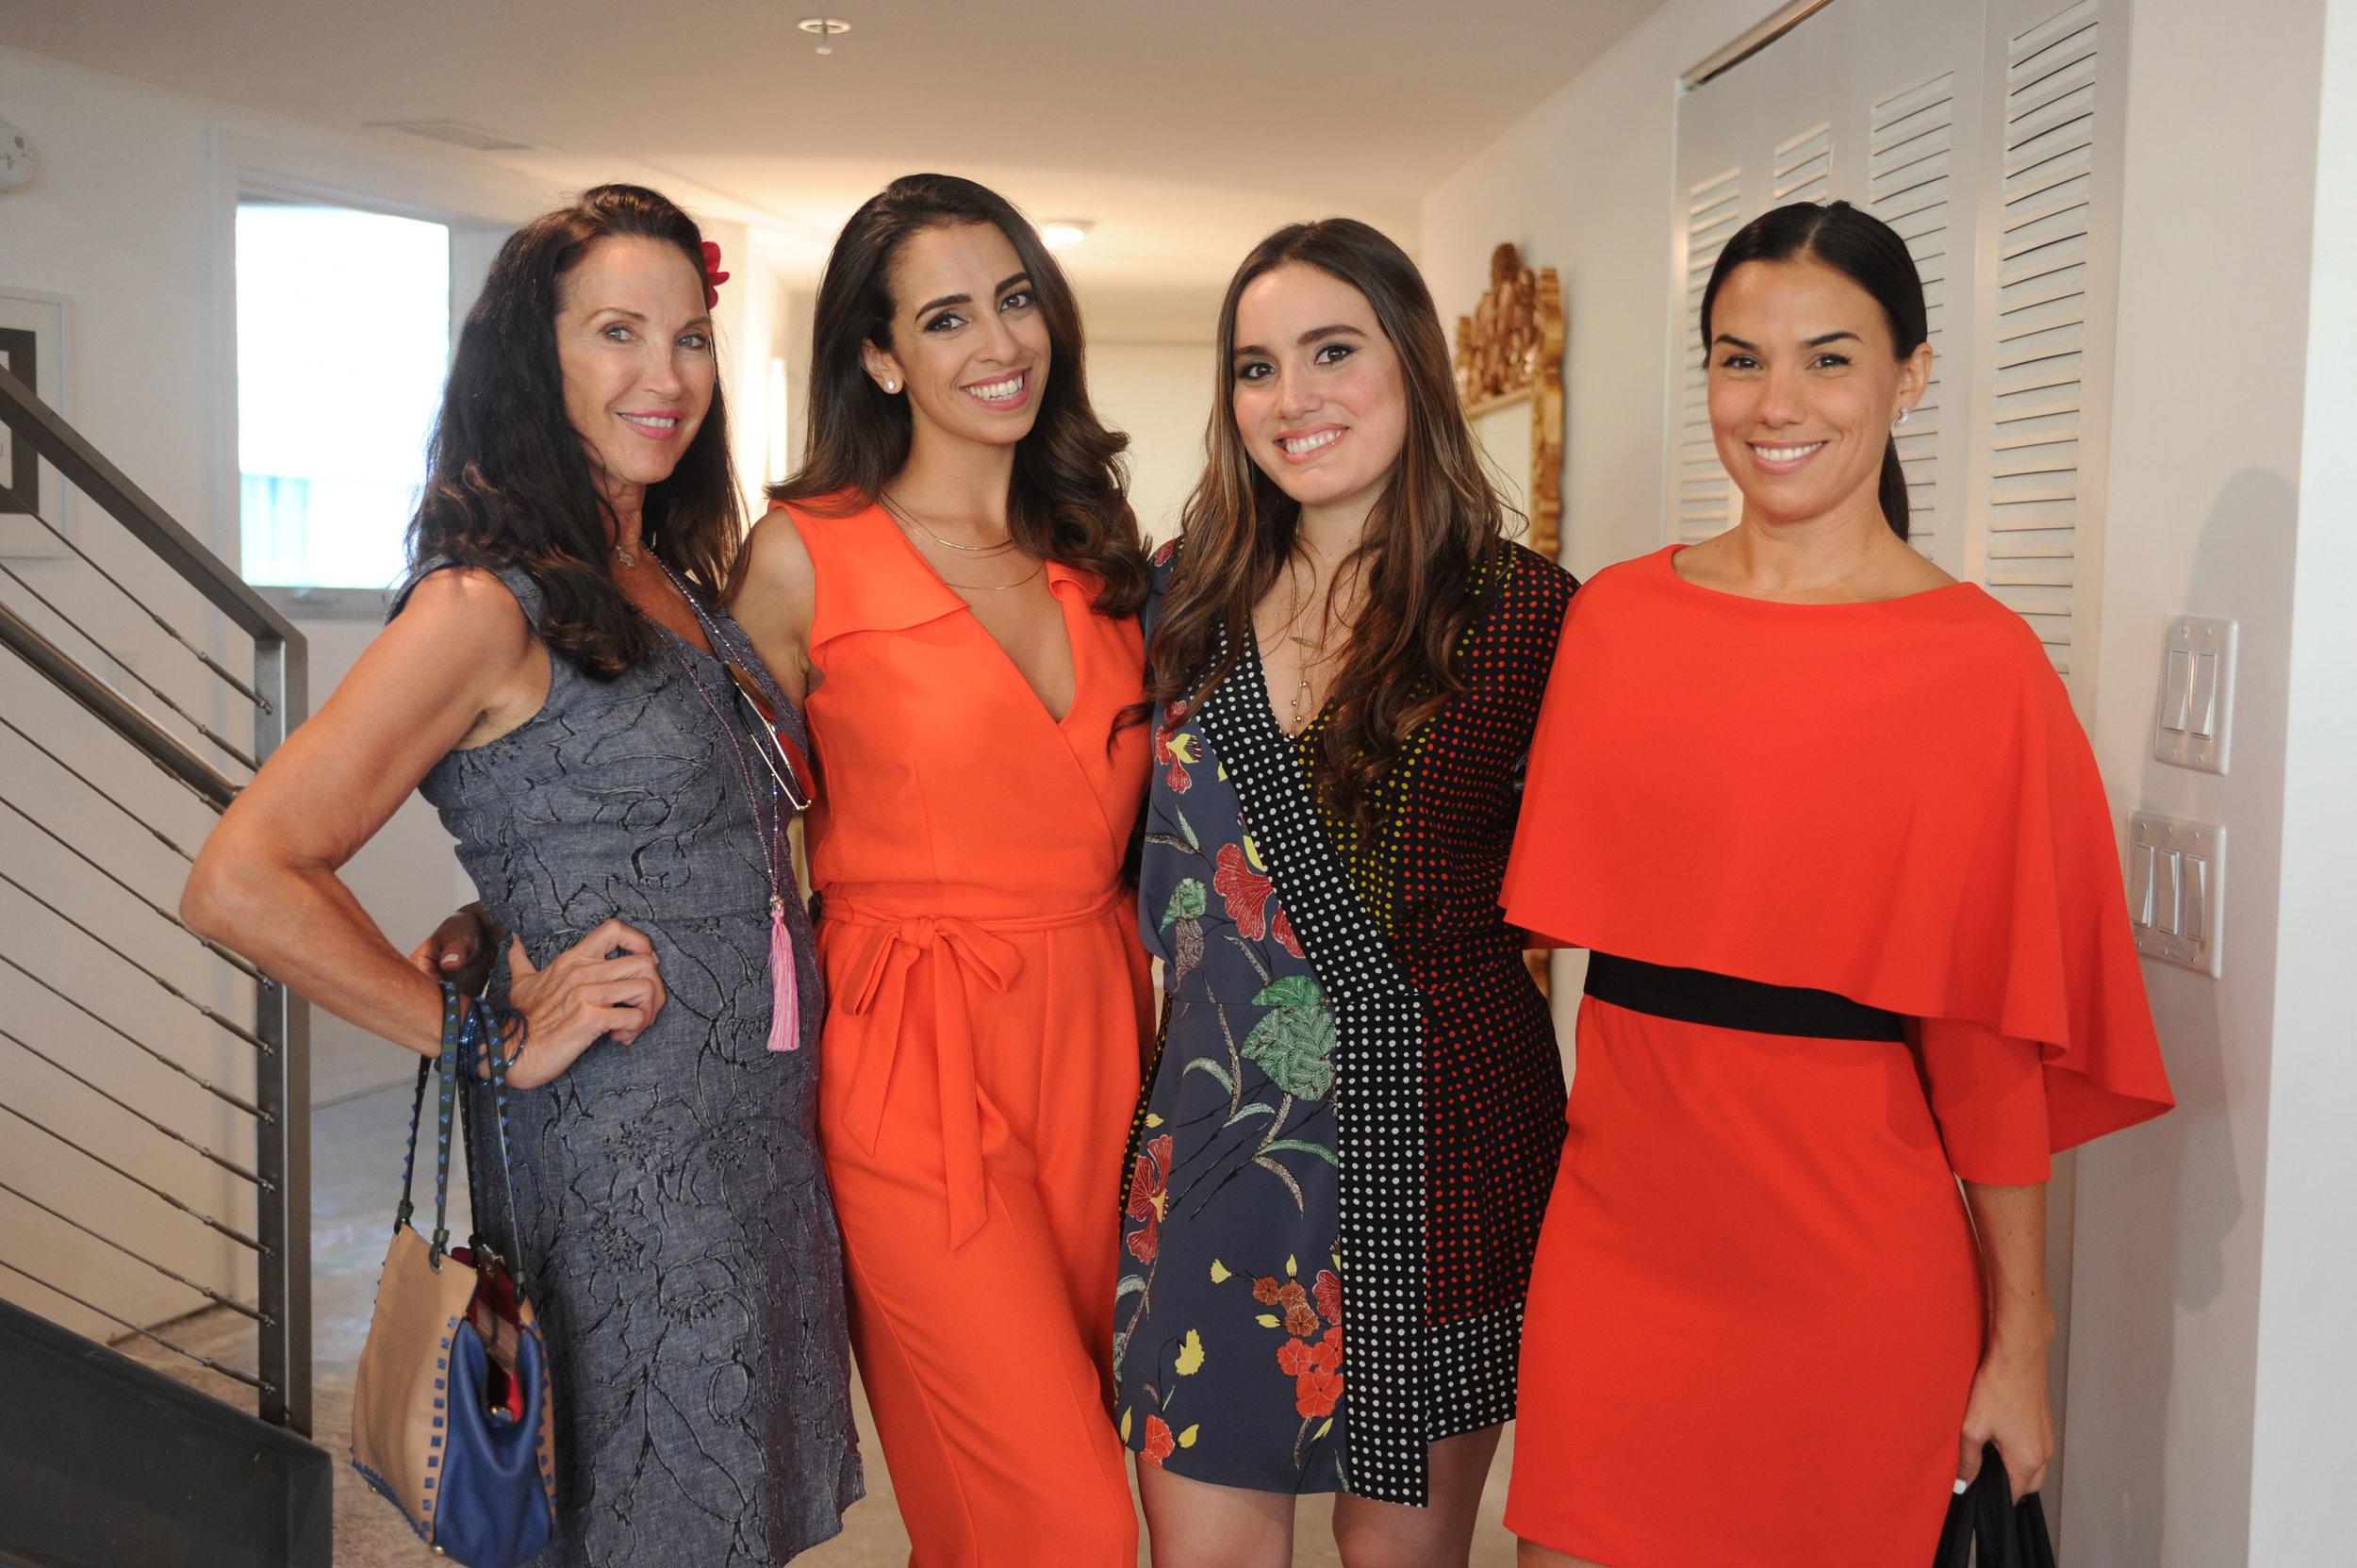 Lisa Almy, Michelle Setty, Alexandra Muinos, & Cristina Ortiz.jpg